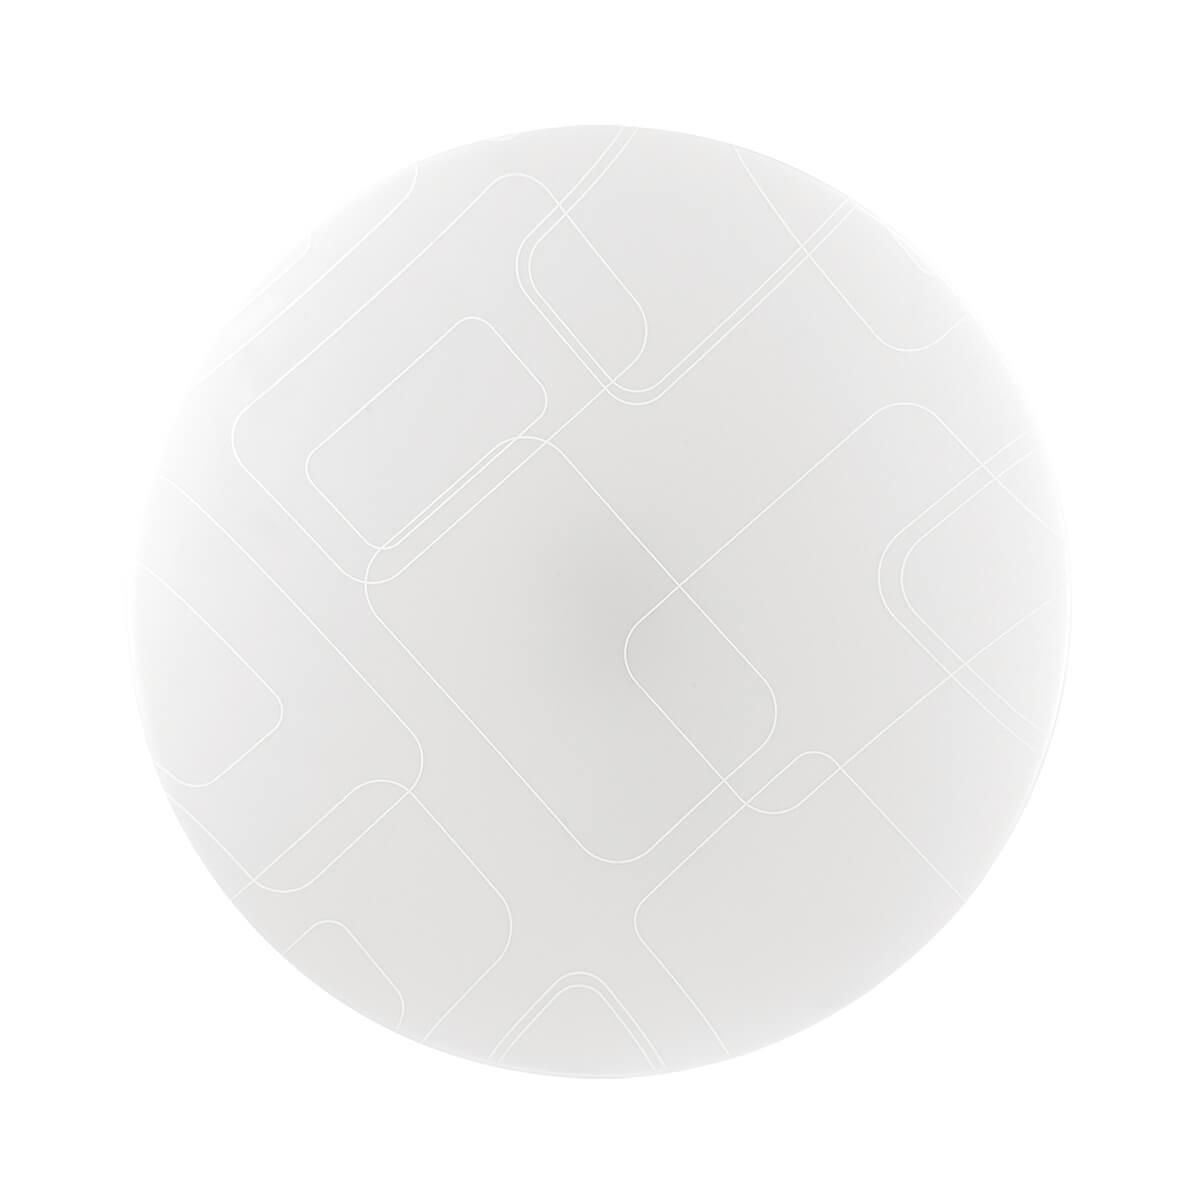 Светильник Sonex 2043/EL светильник sonex 2049 el